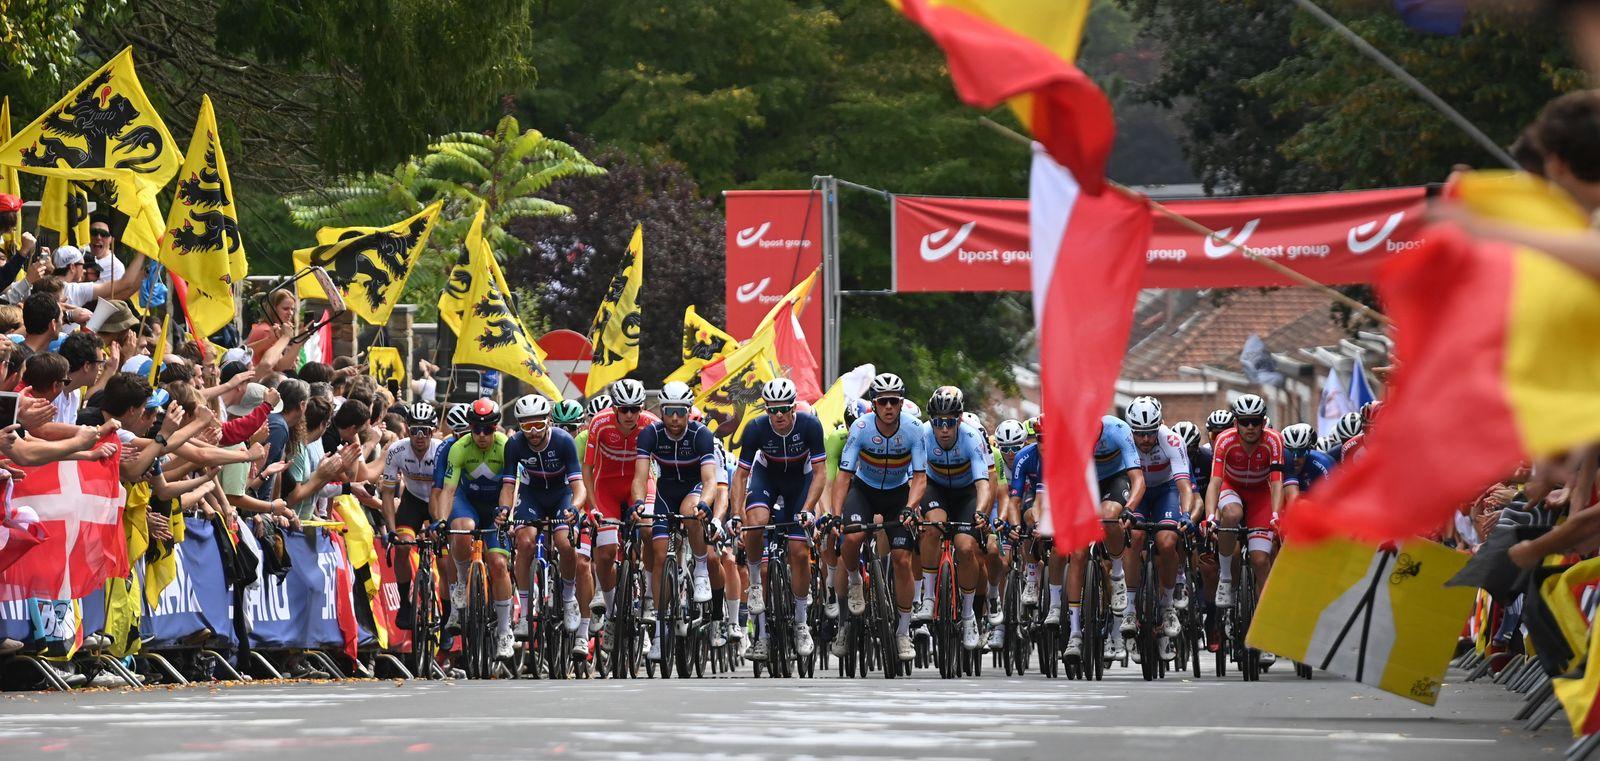 CYCLING WORLD CHAMPIONSHIPS 2021 FLANDERS ELITE